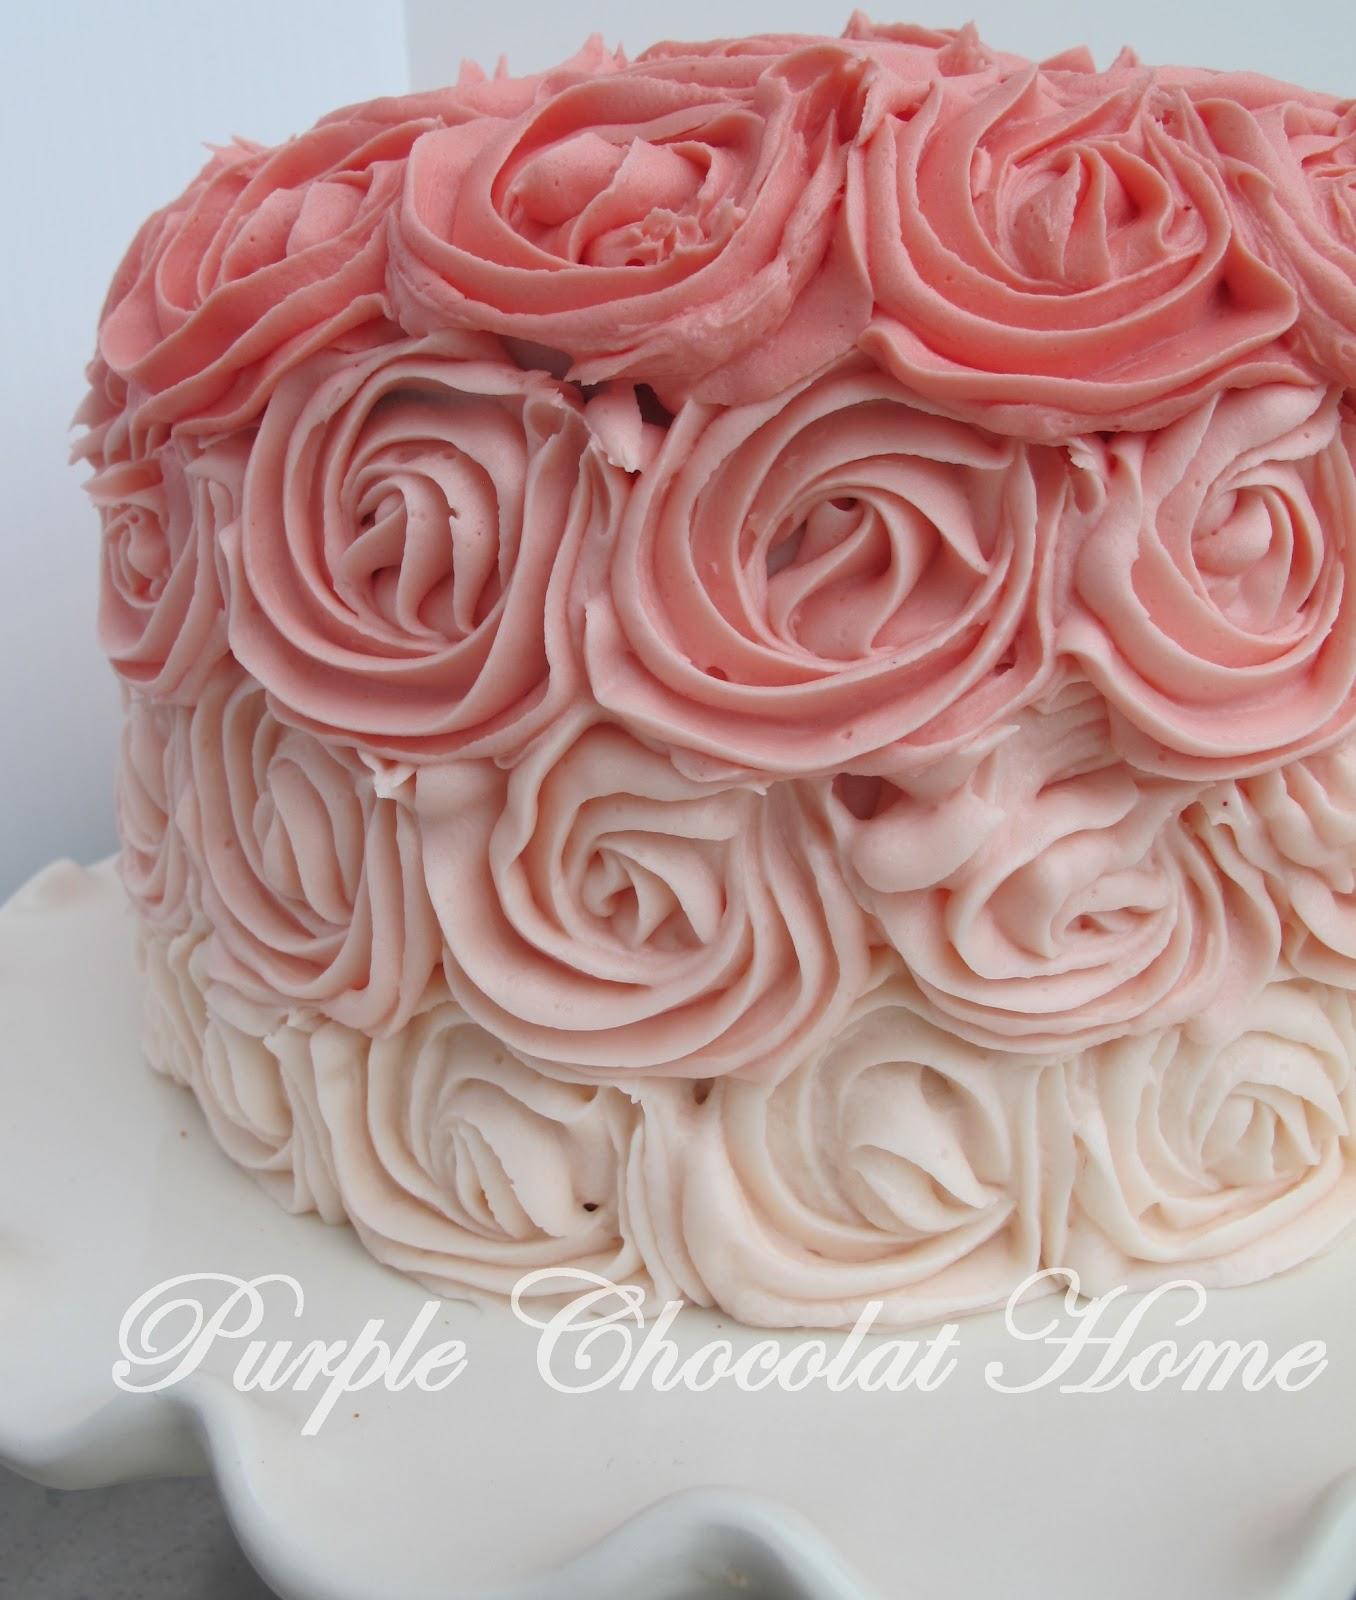 Ombre Rose Cake - Purple Chocolat Home